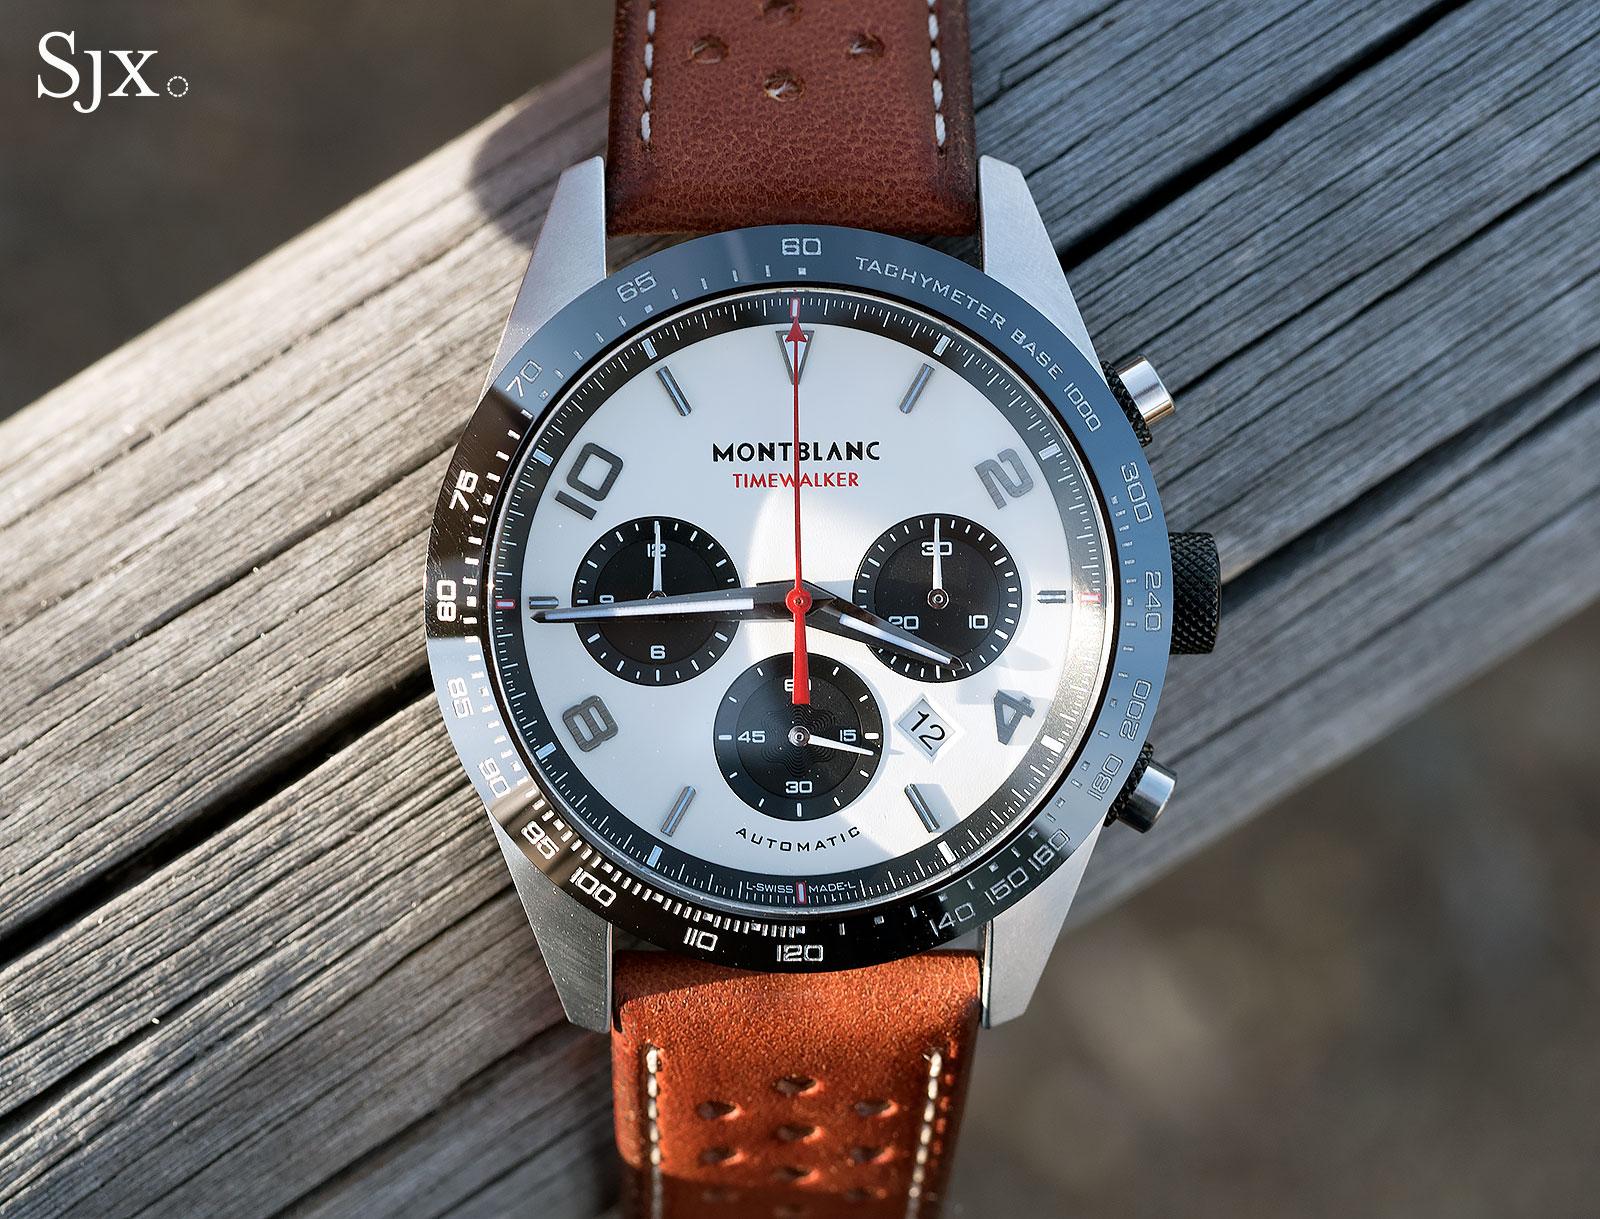 Montblanc Montblanc TimeWalker Manufacture Chronograph 1